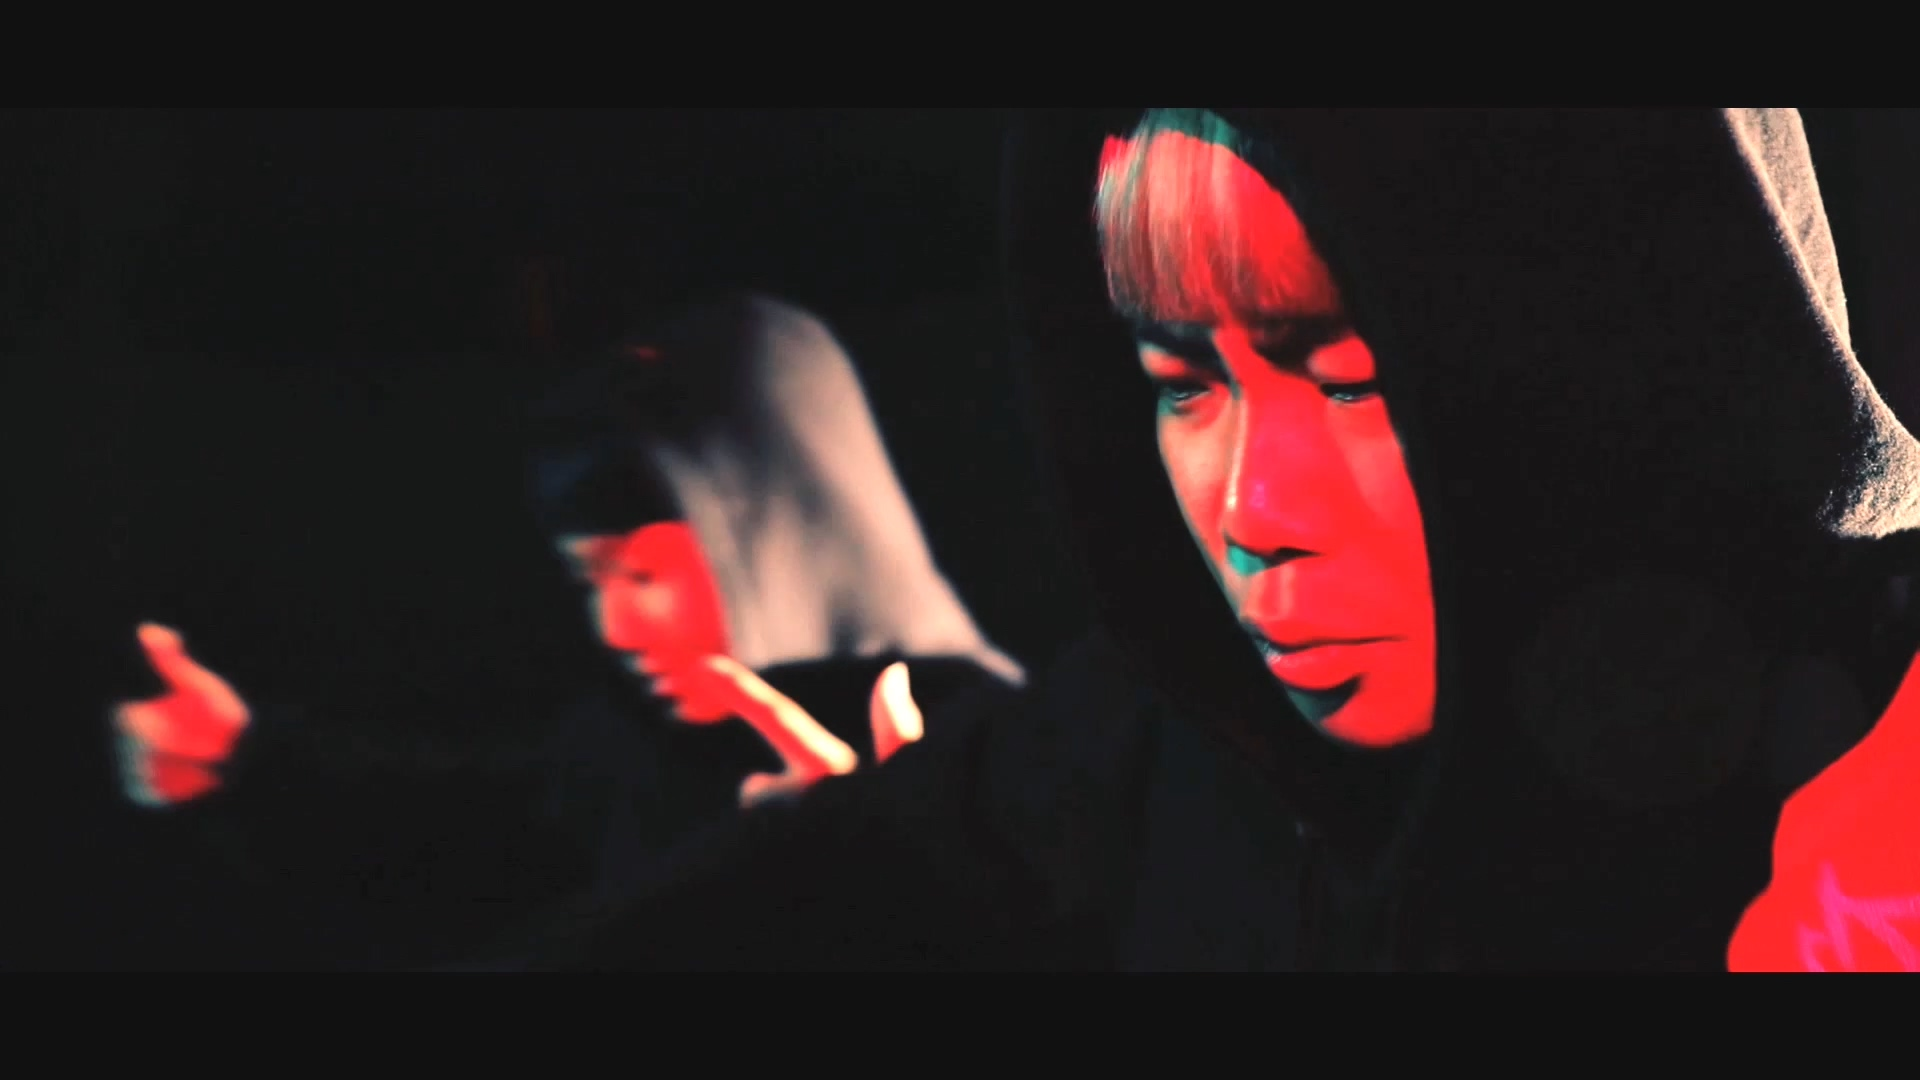 [MVP MV] H-has & Hiss - 이태원 프리덤 New Acappella (Prod. by 뮤지)  이미지